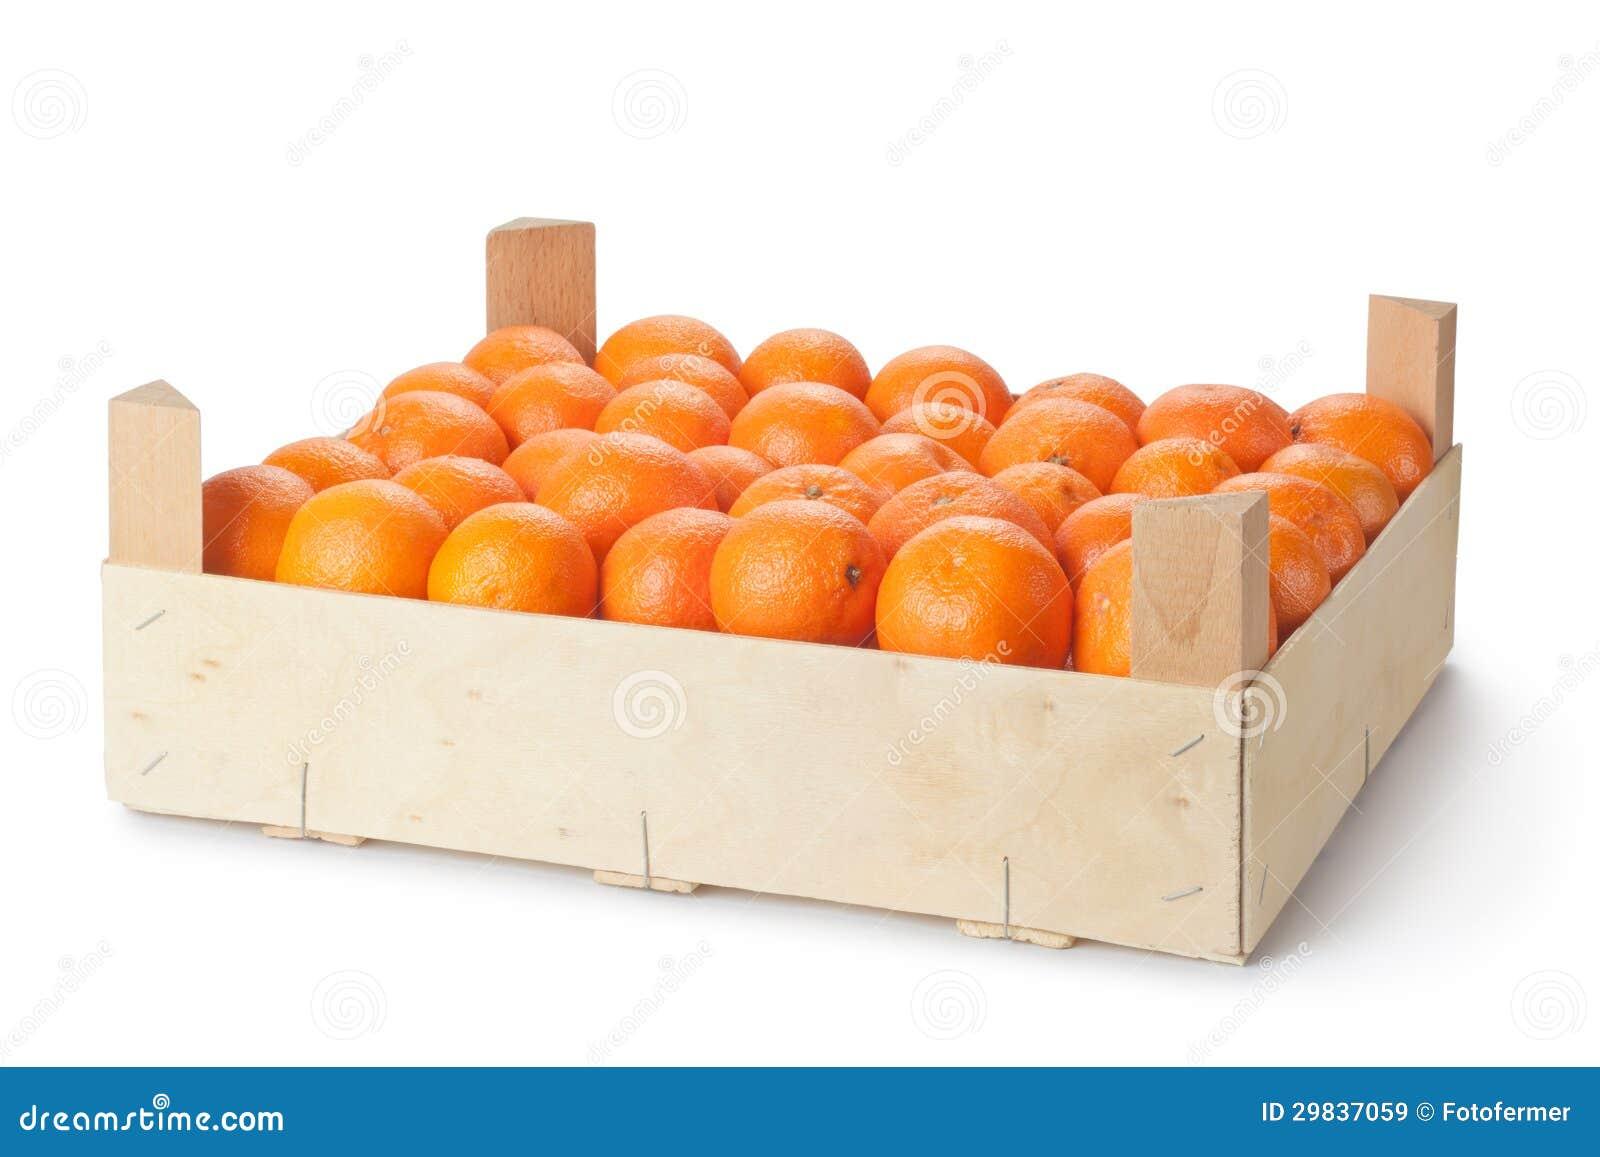 Caixa de varejo de tangerinas maduras